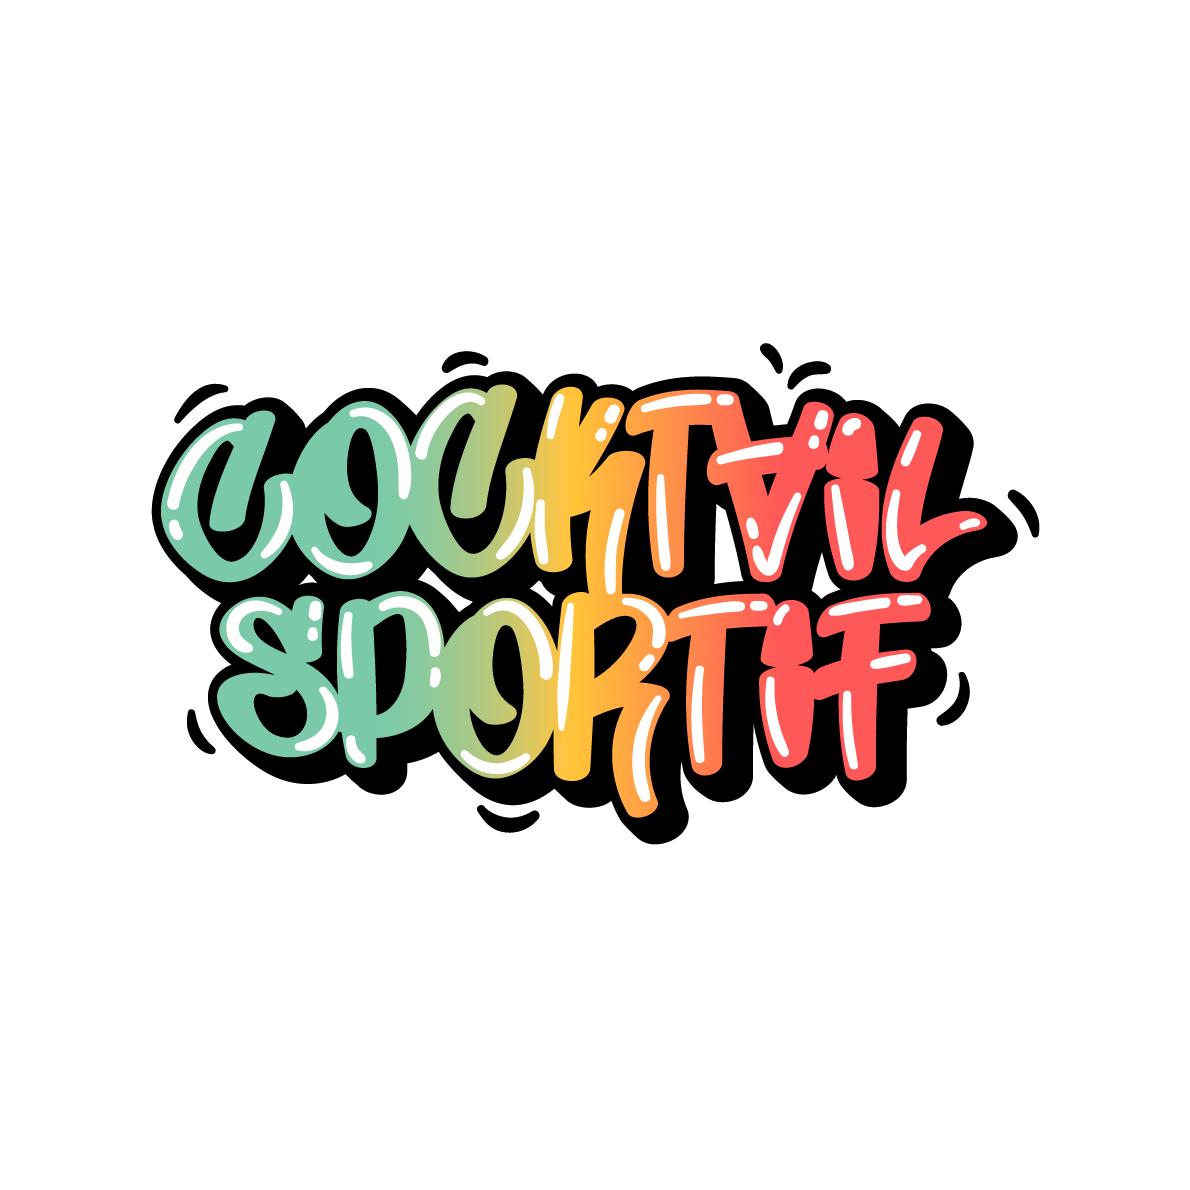 logo cocktail sportif couleurs